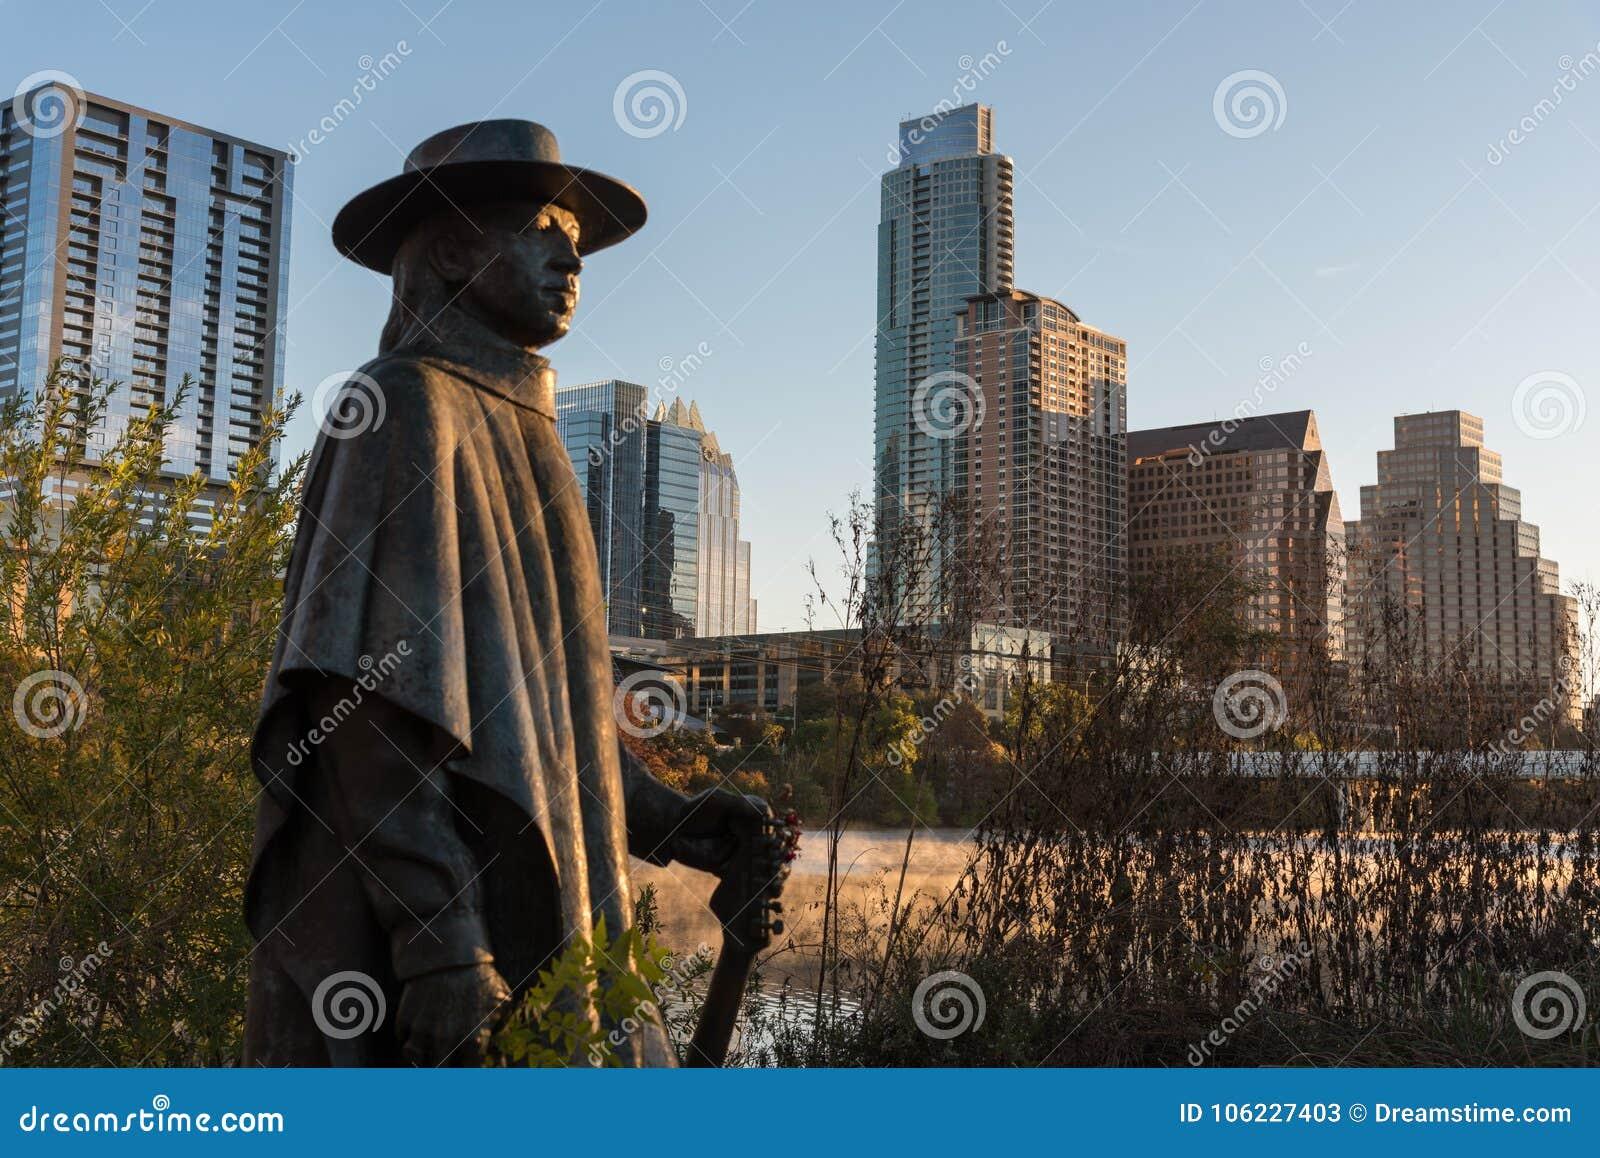 Austin Texas Stevie Ray Vaughan Statue all alba